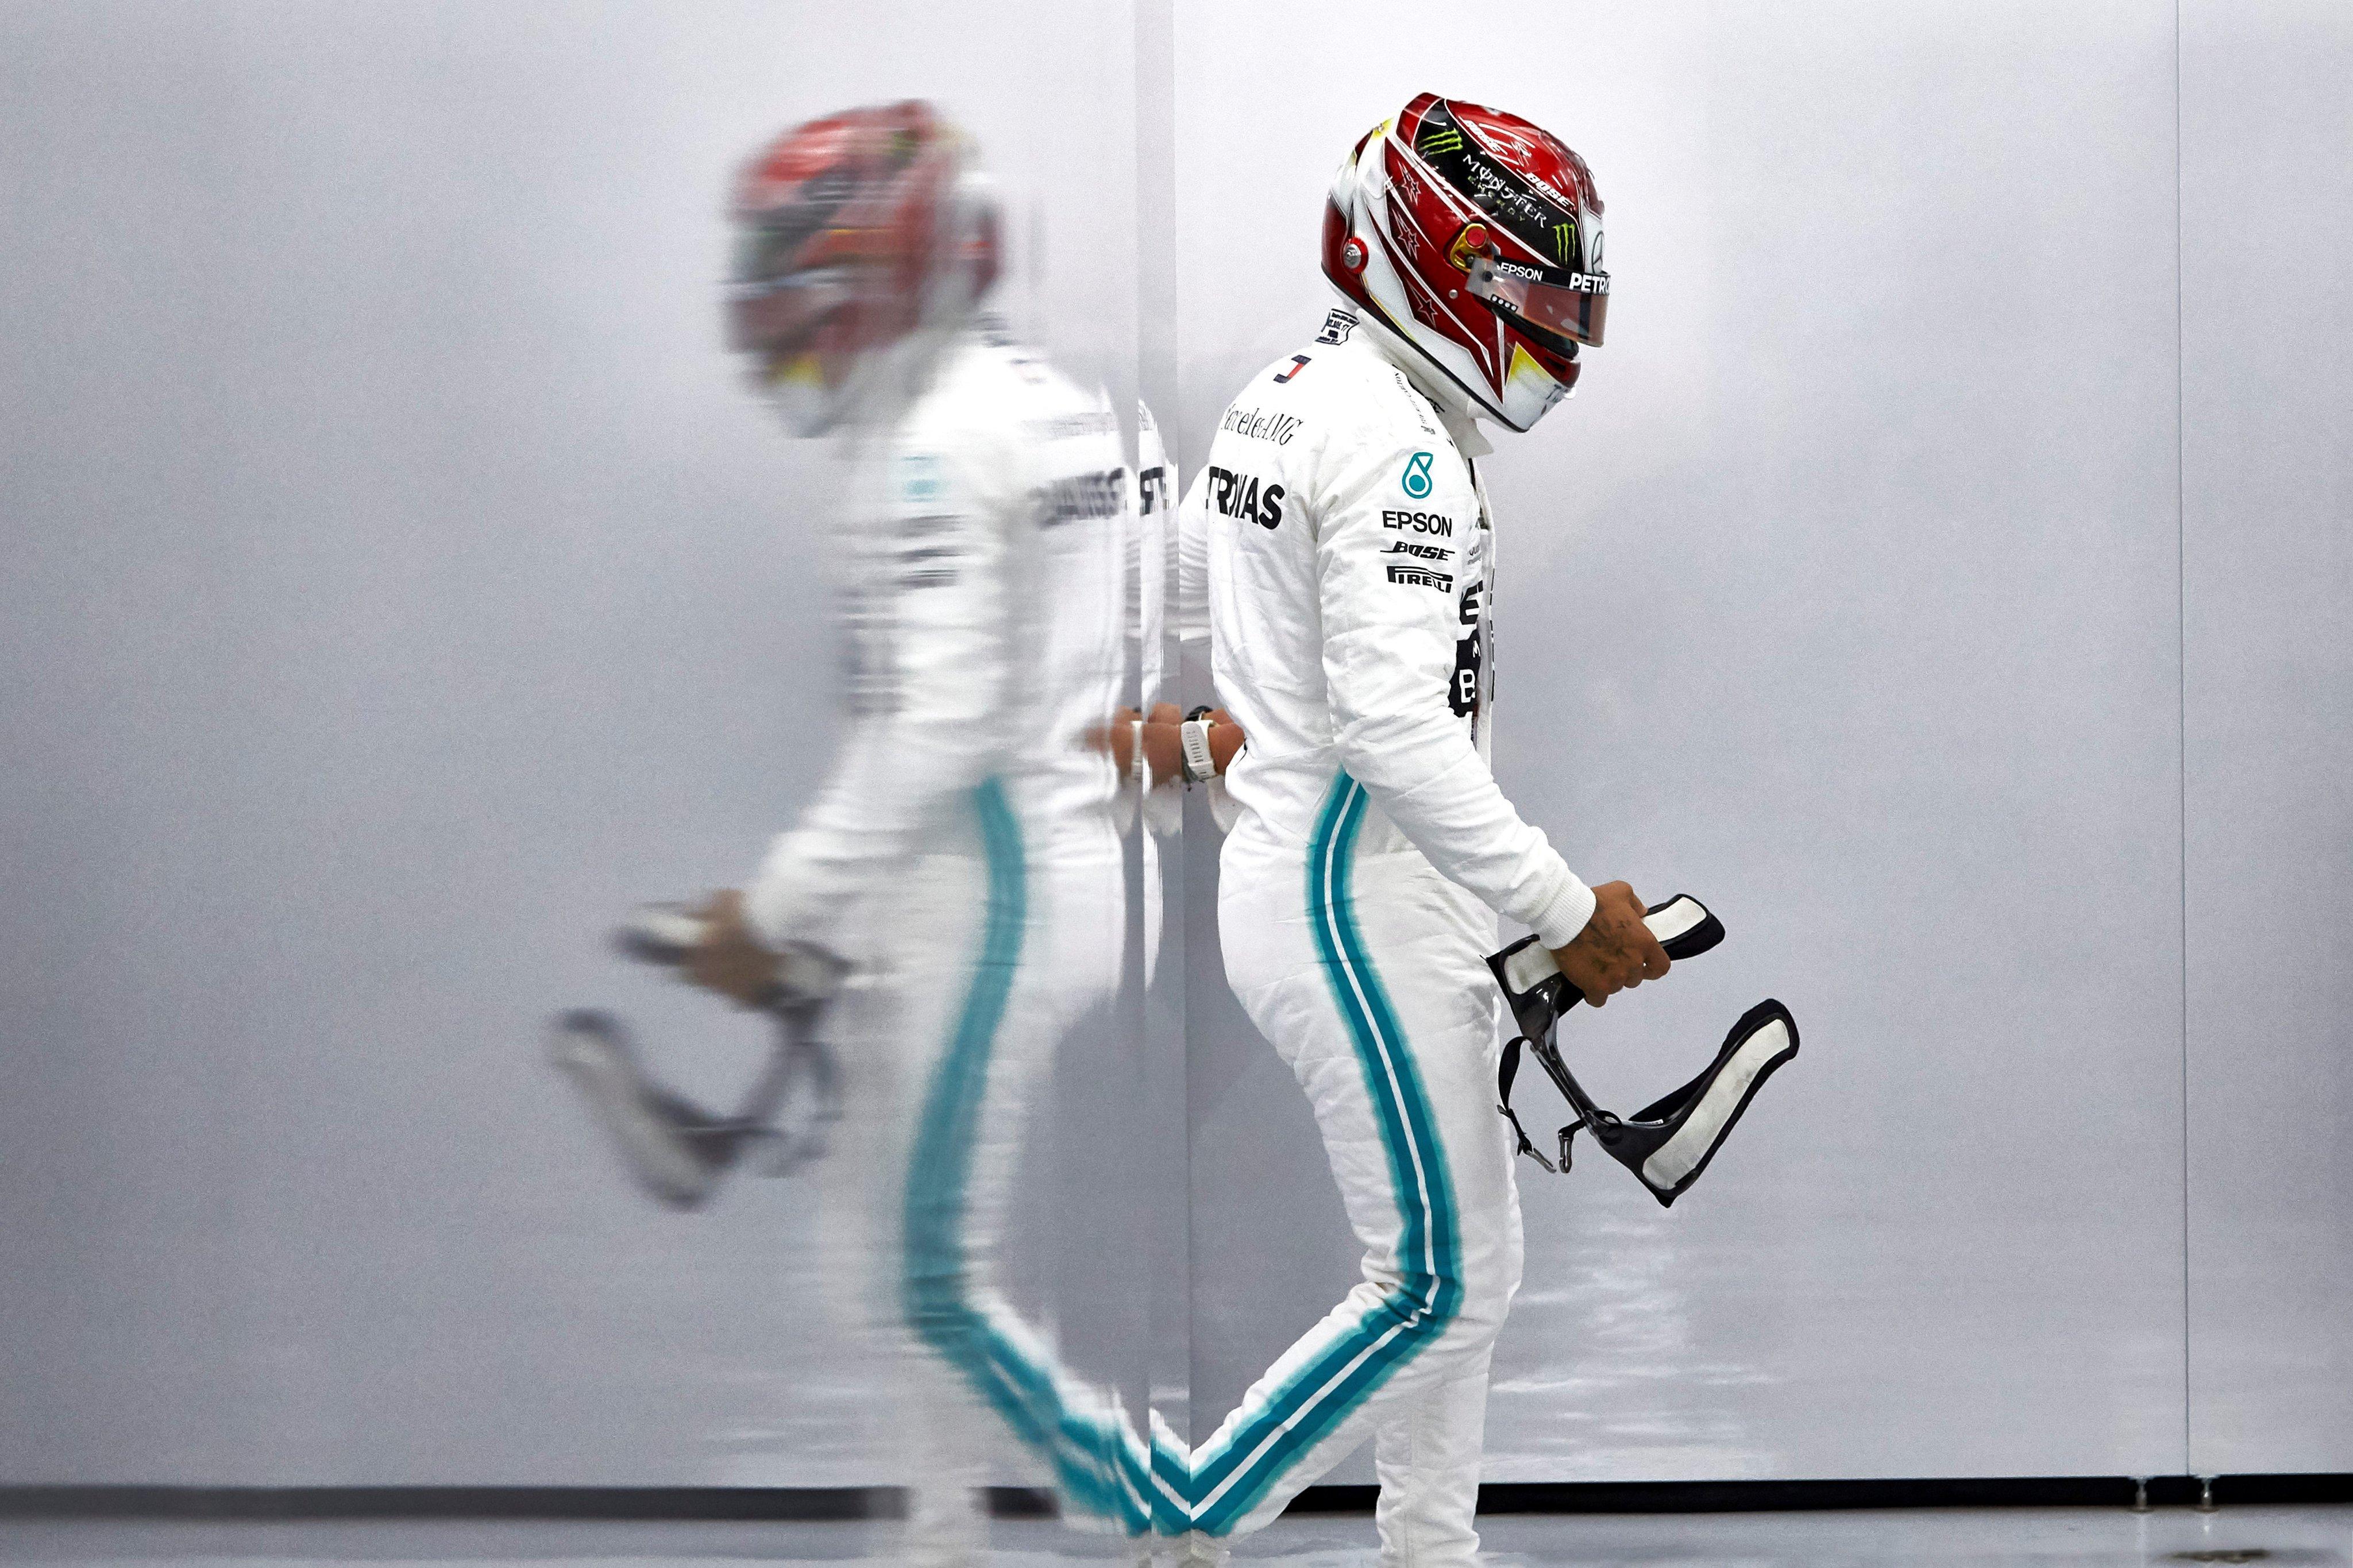 Lewis Hamilton, un 'influencer' de lujo - SoyMotor.com